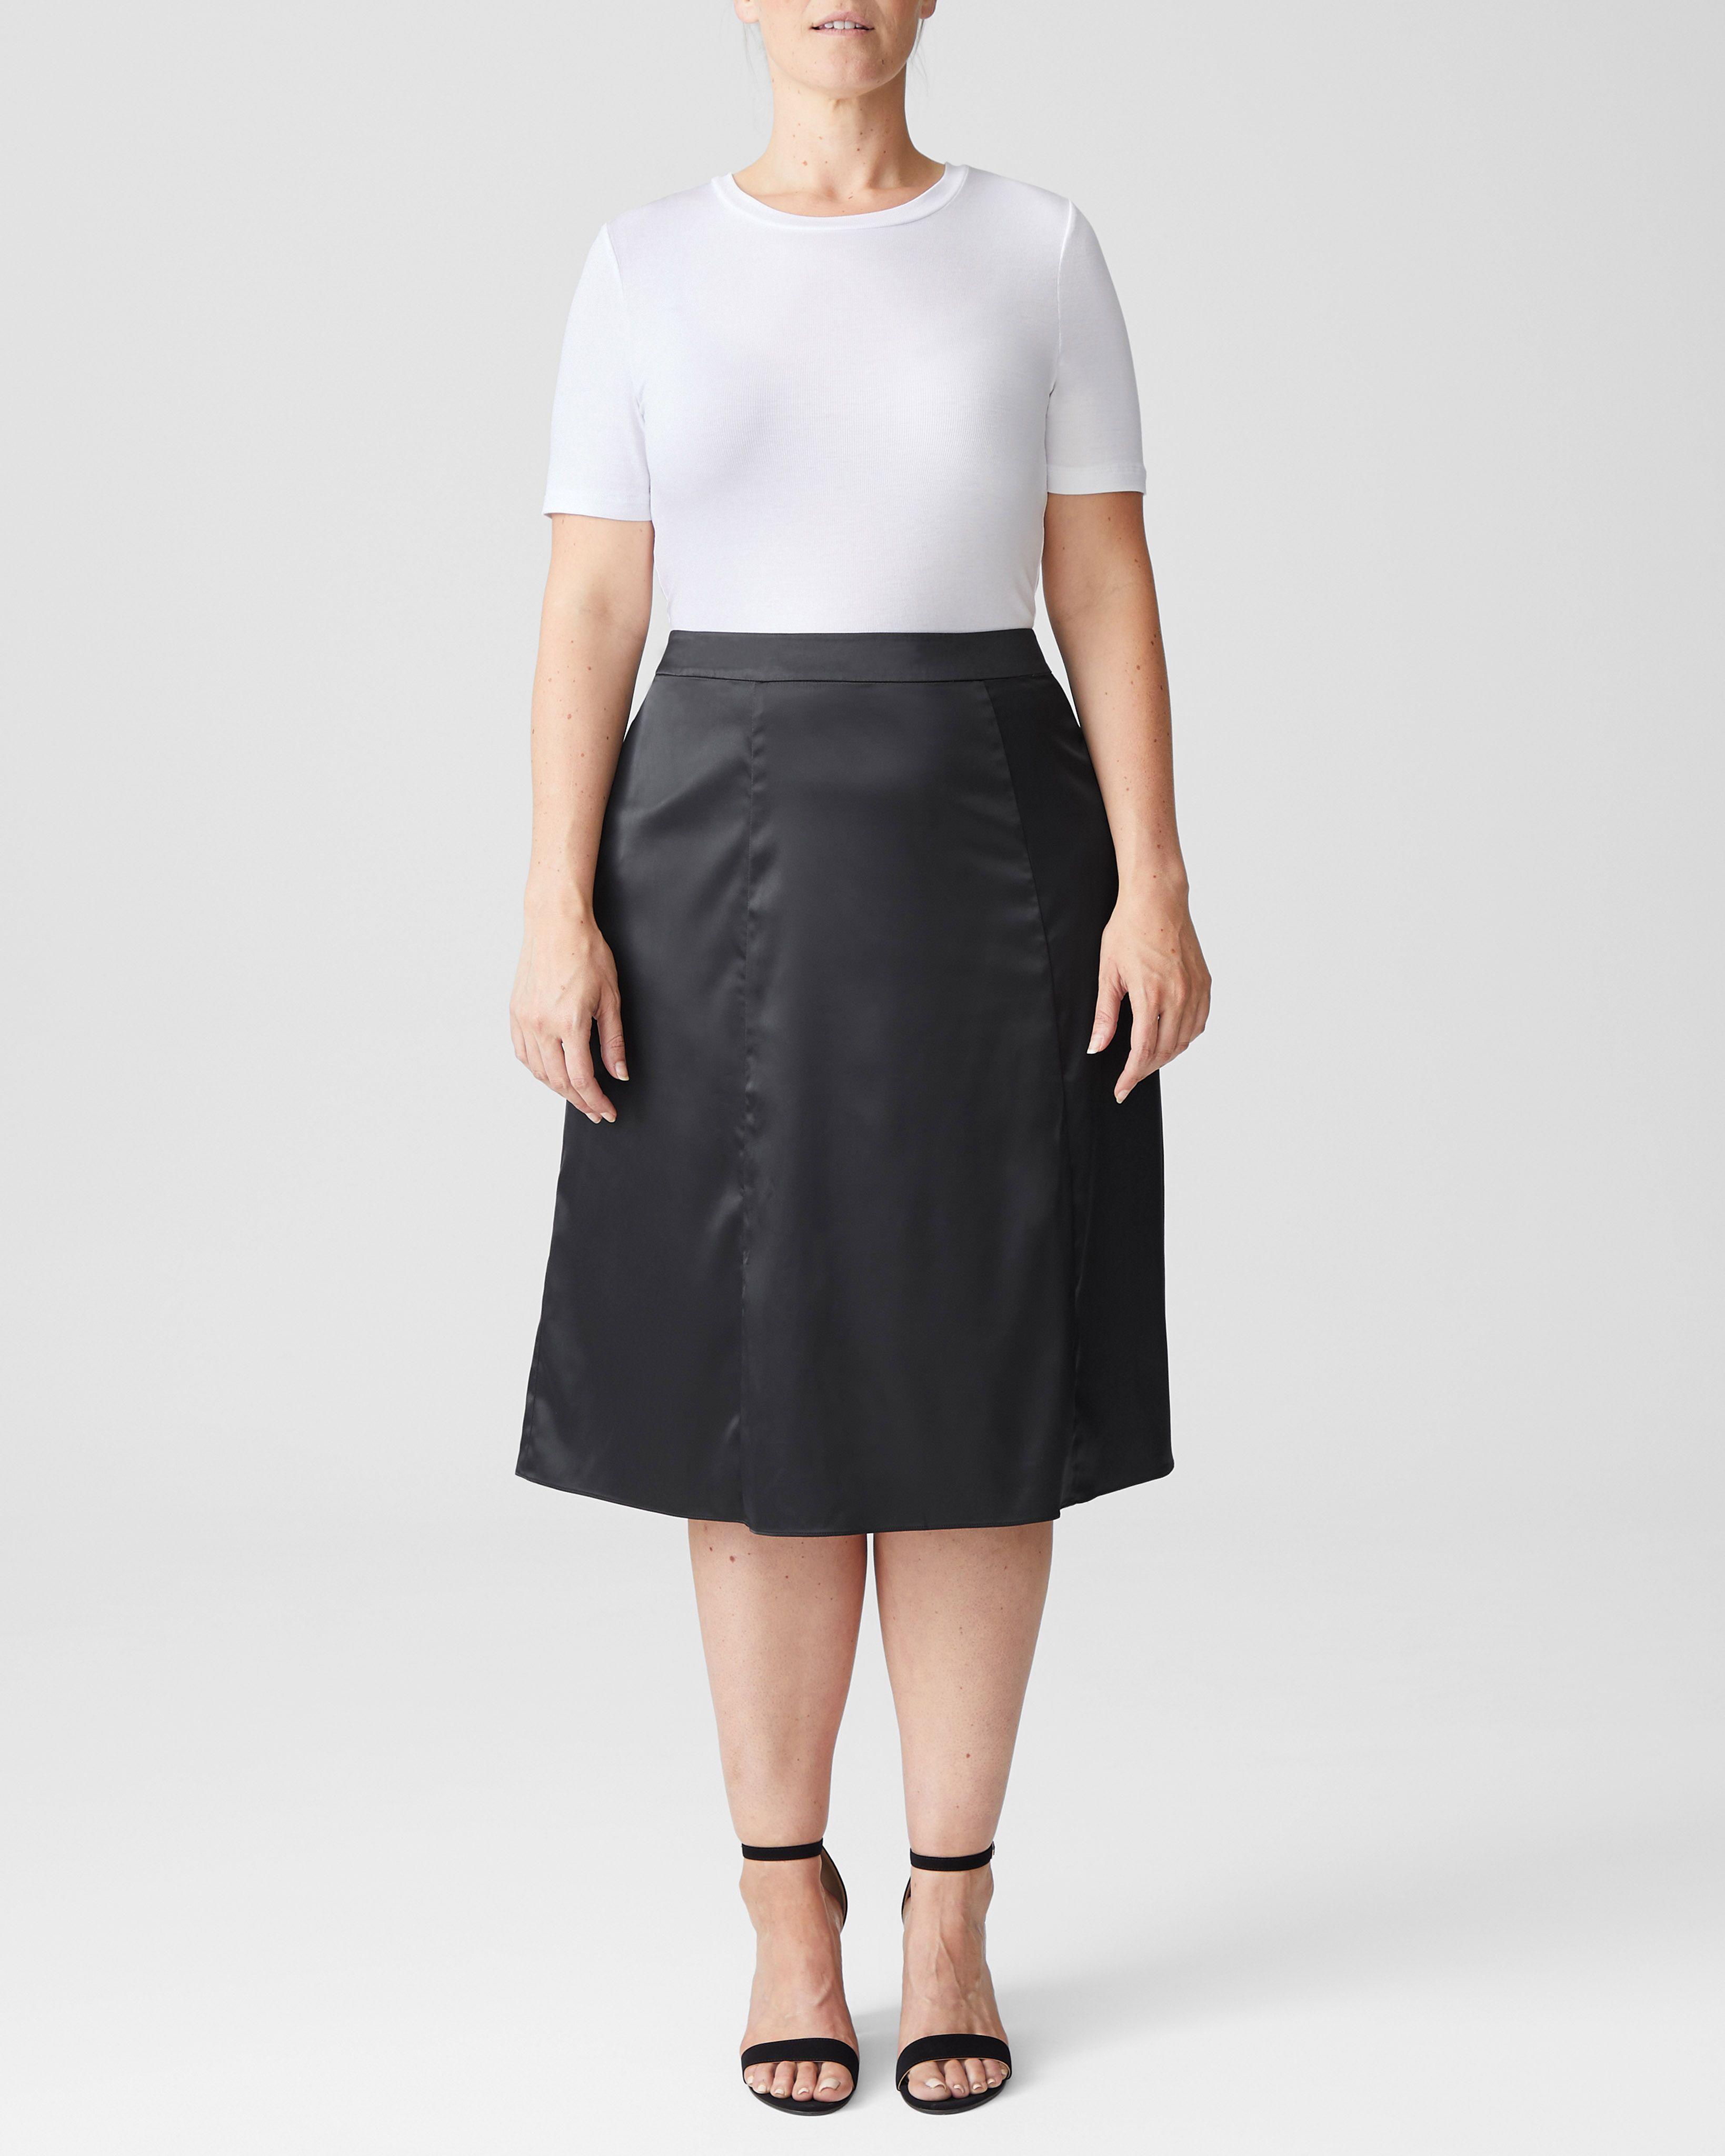 Jessica Skirt - Glossy Black